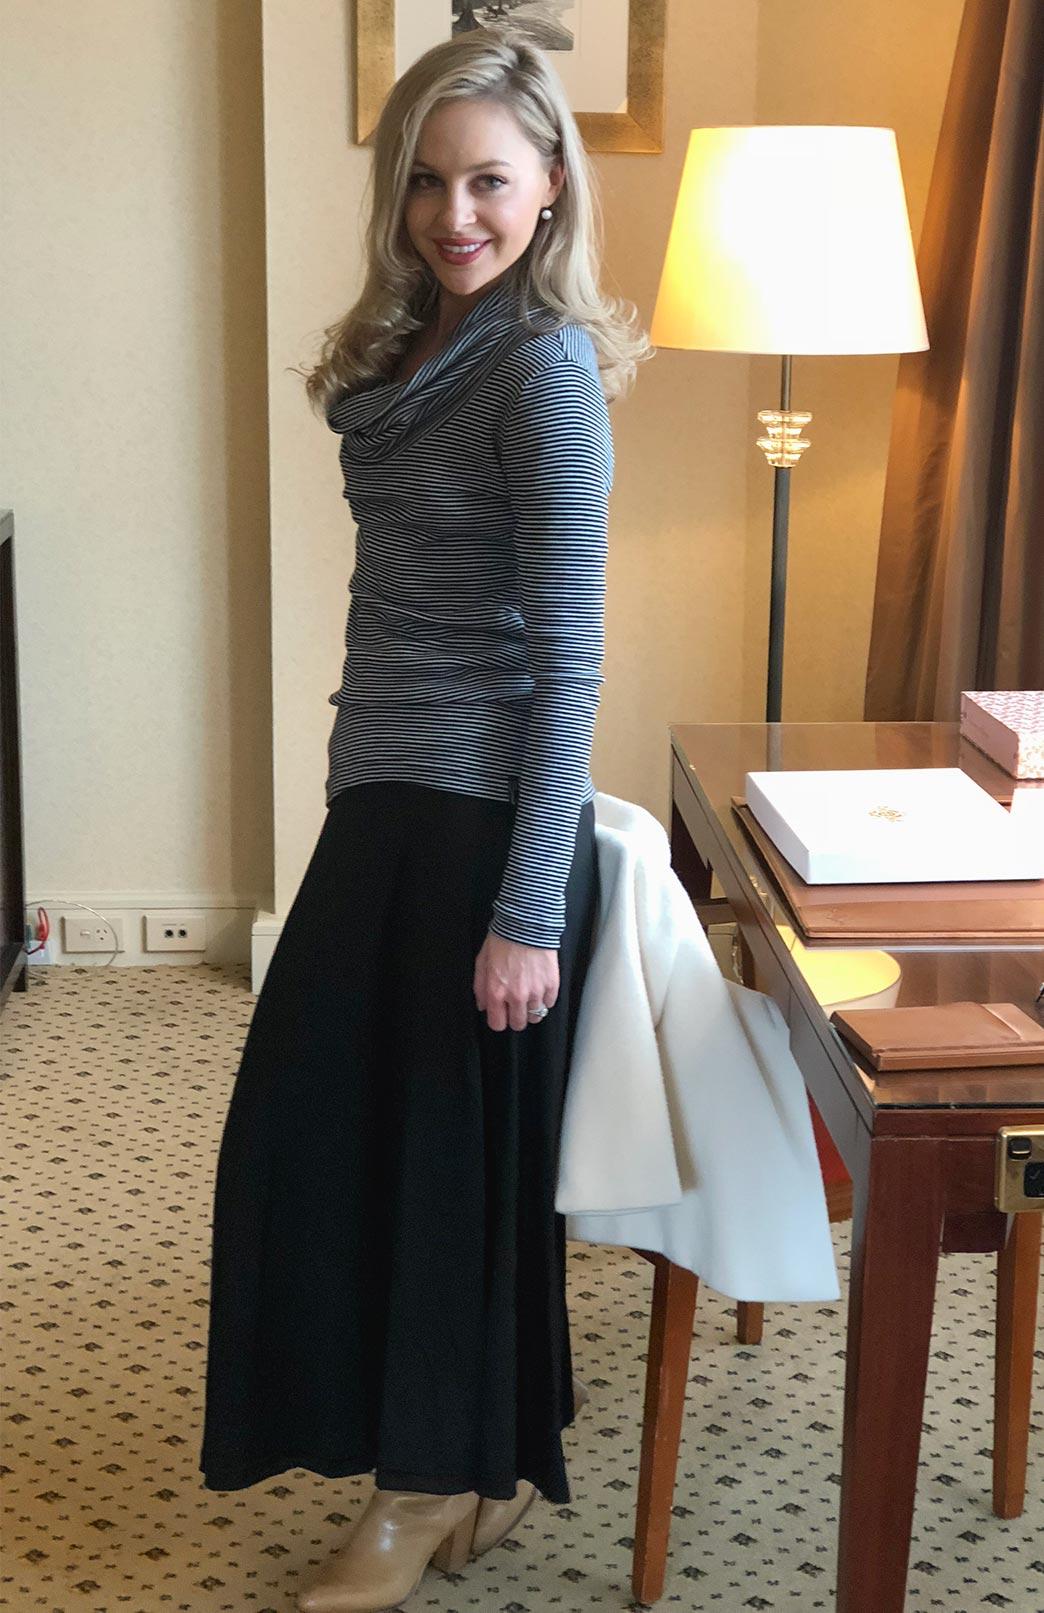 Marion Maxi Skirt - Women's Black Merino Wool Maxi Skirt - Smitten Merino Tasmania Australia